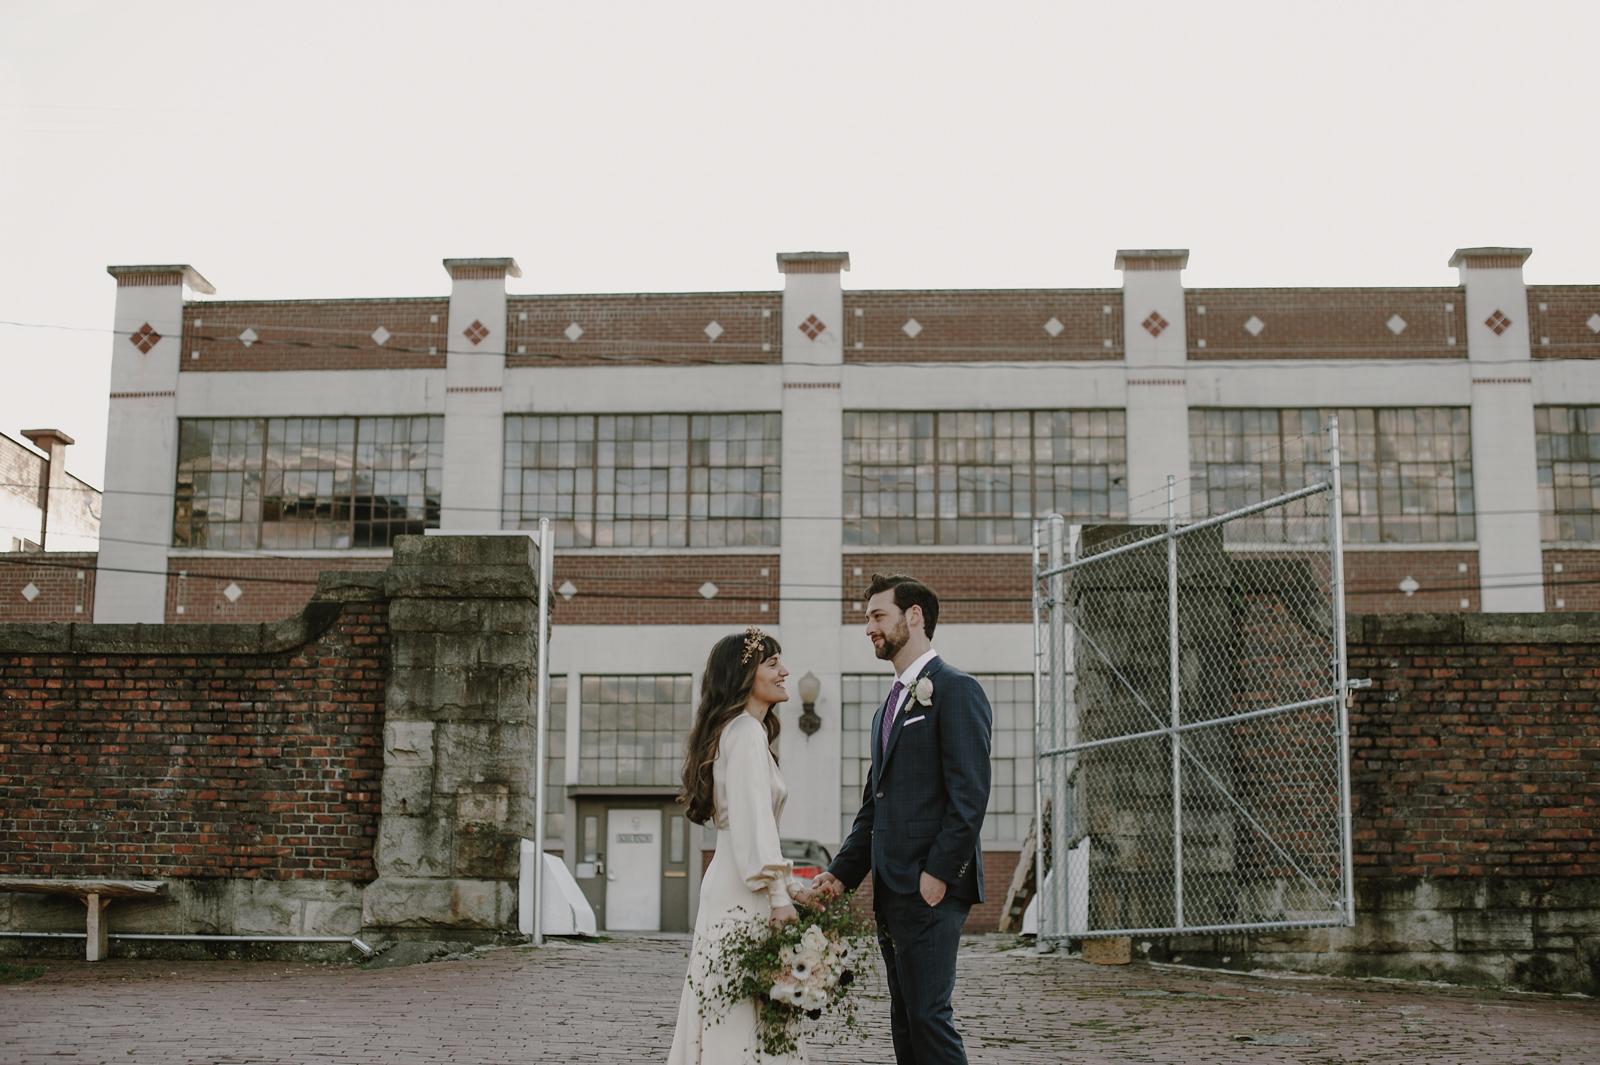 kristenmarieparker_tacoma_conservatory_warehouse_wedding074.JPG